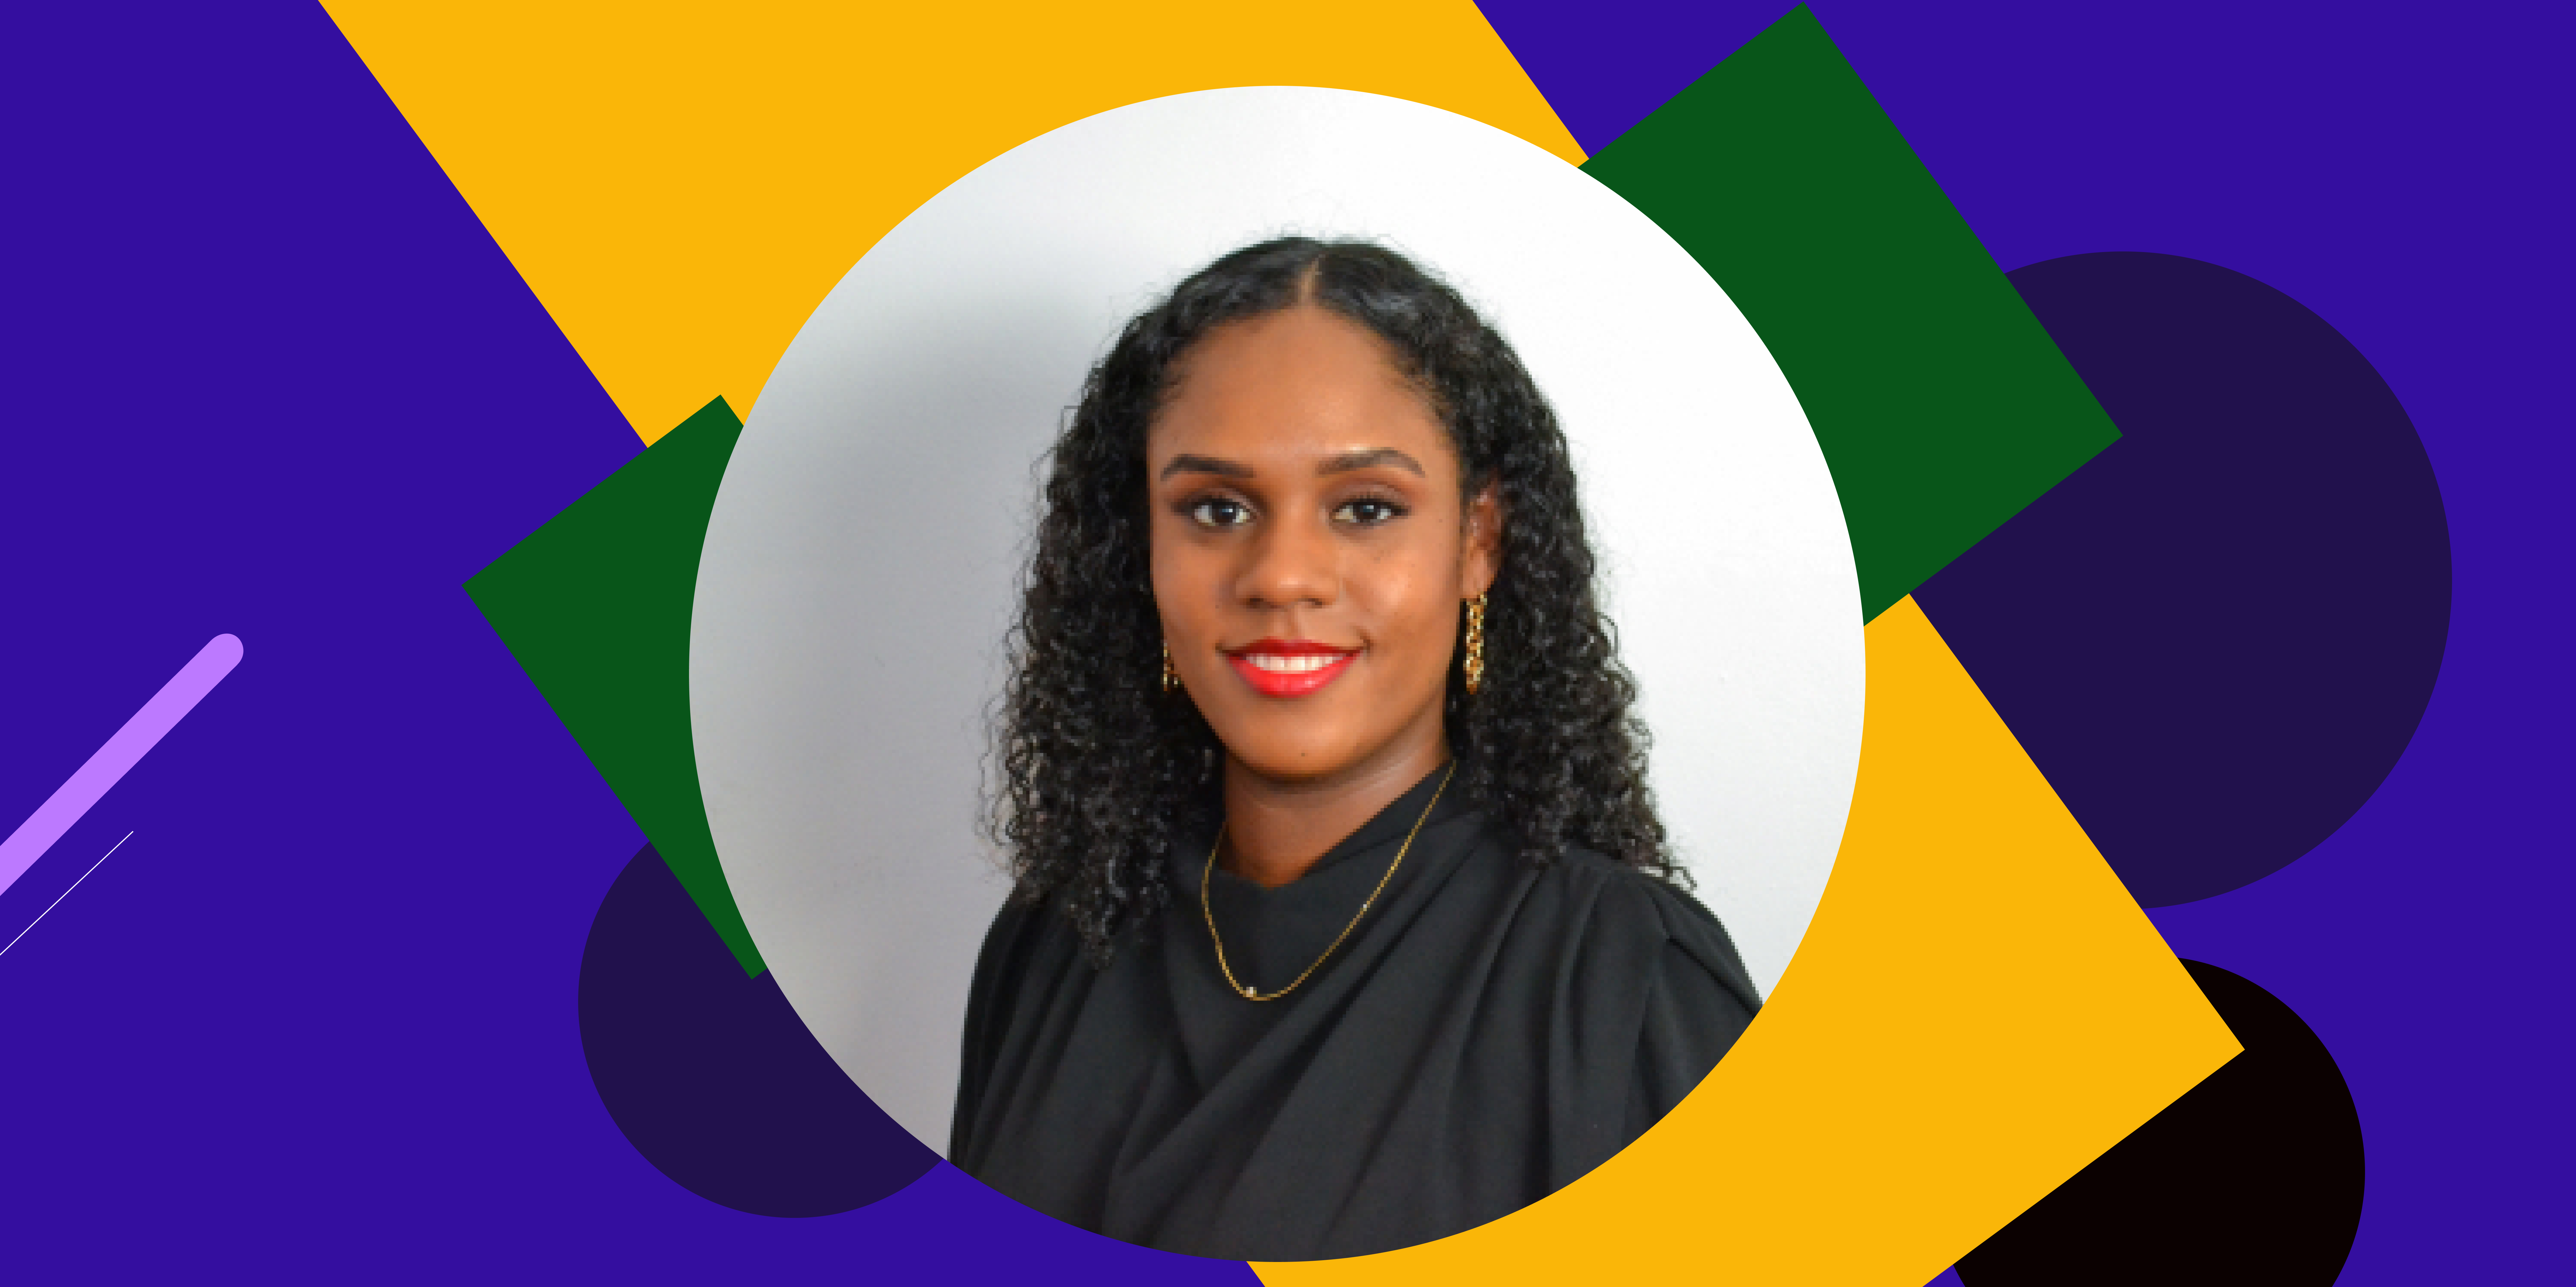 emmanuelle-ozier-edu-carib-educarib-chef-de-projets-si-crm